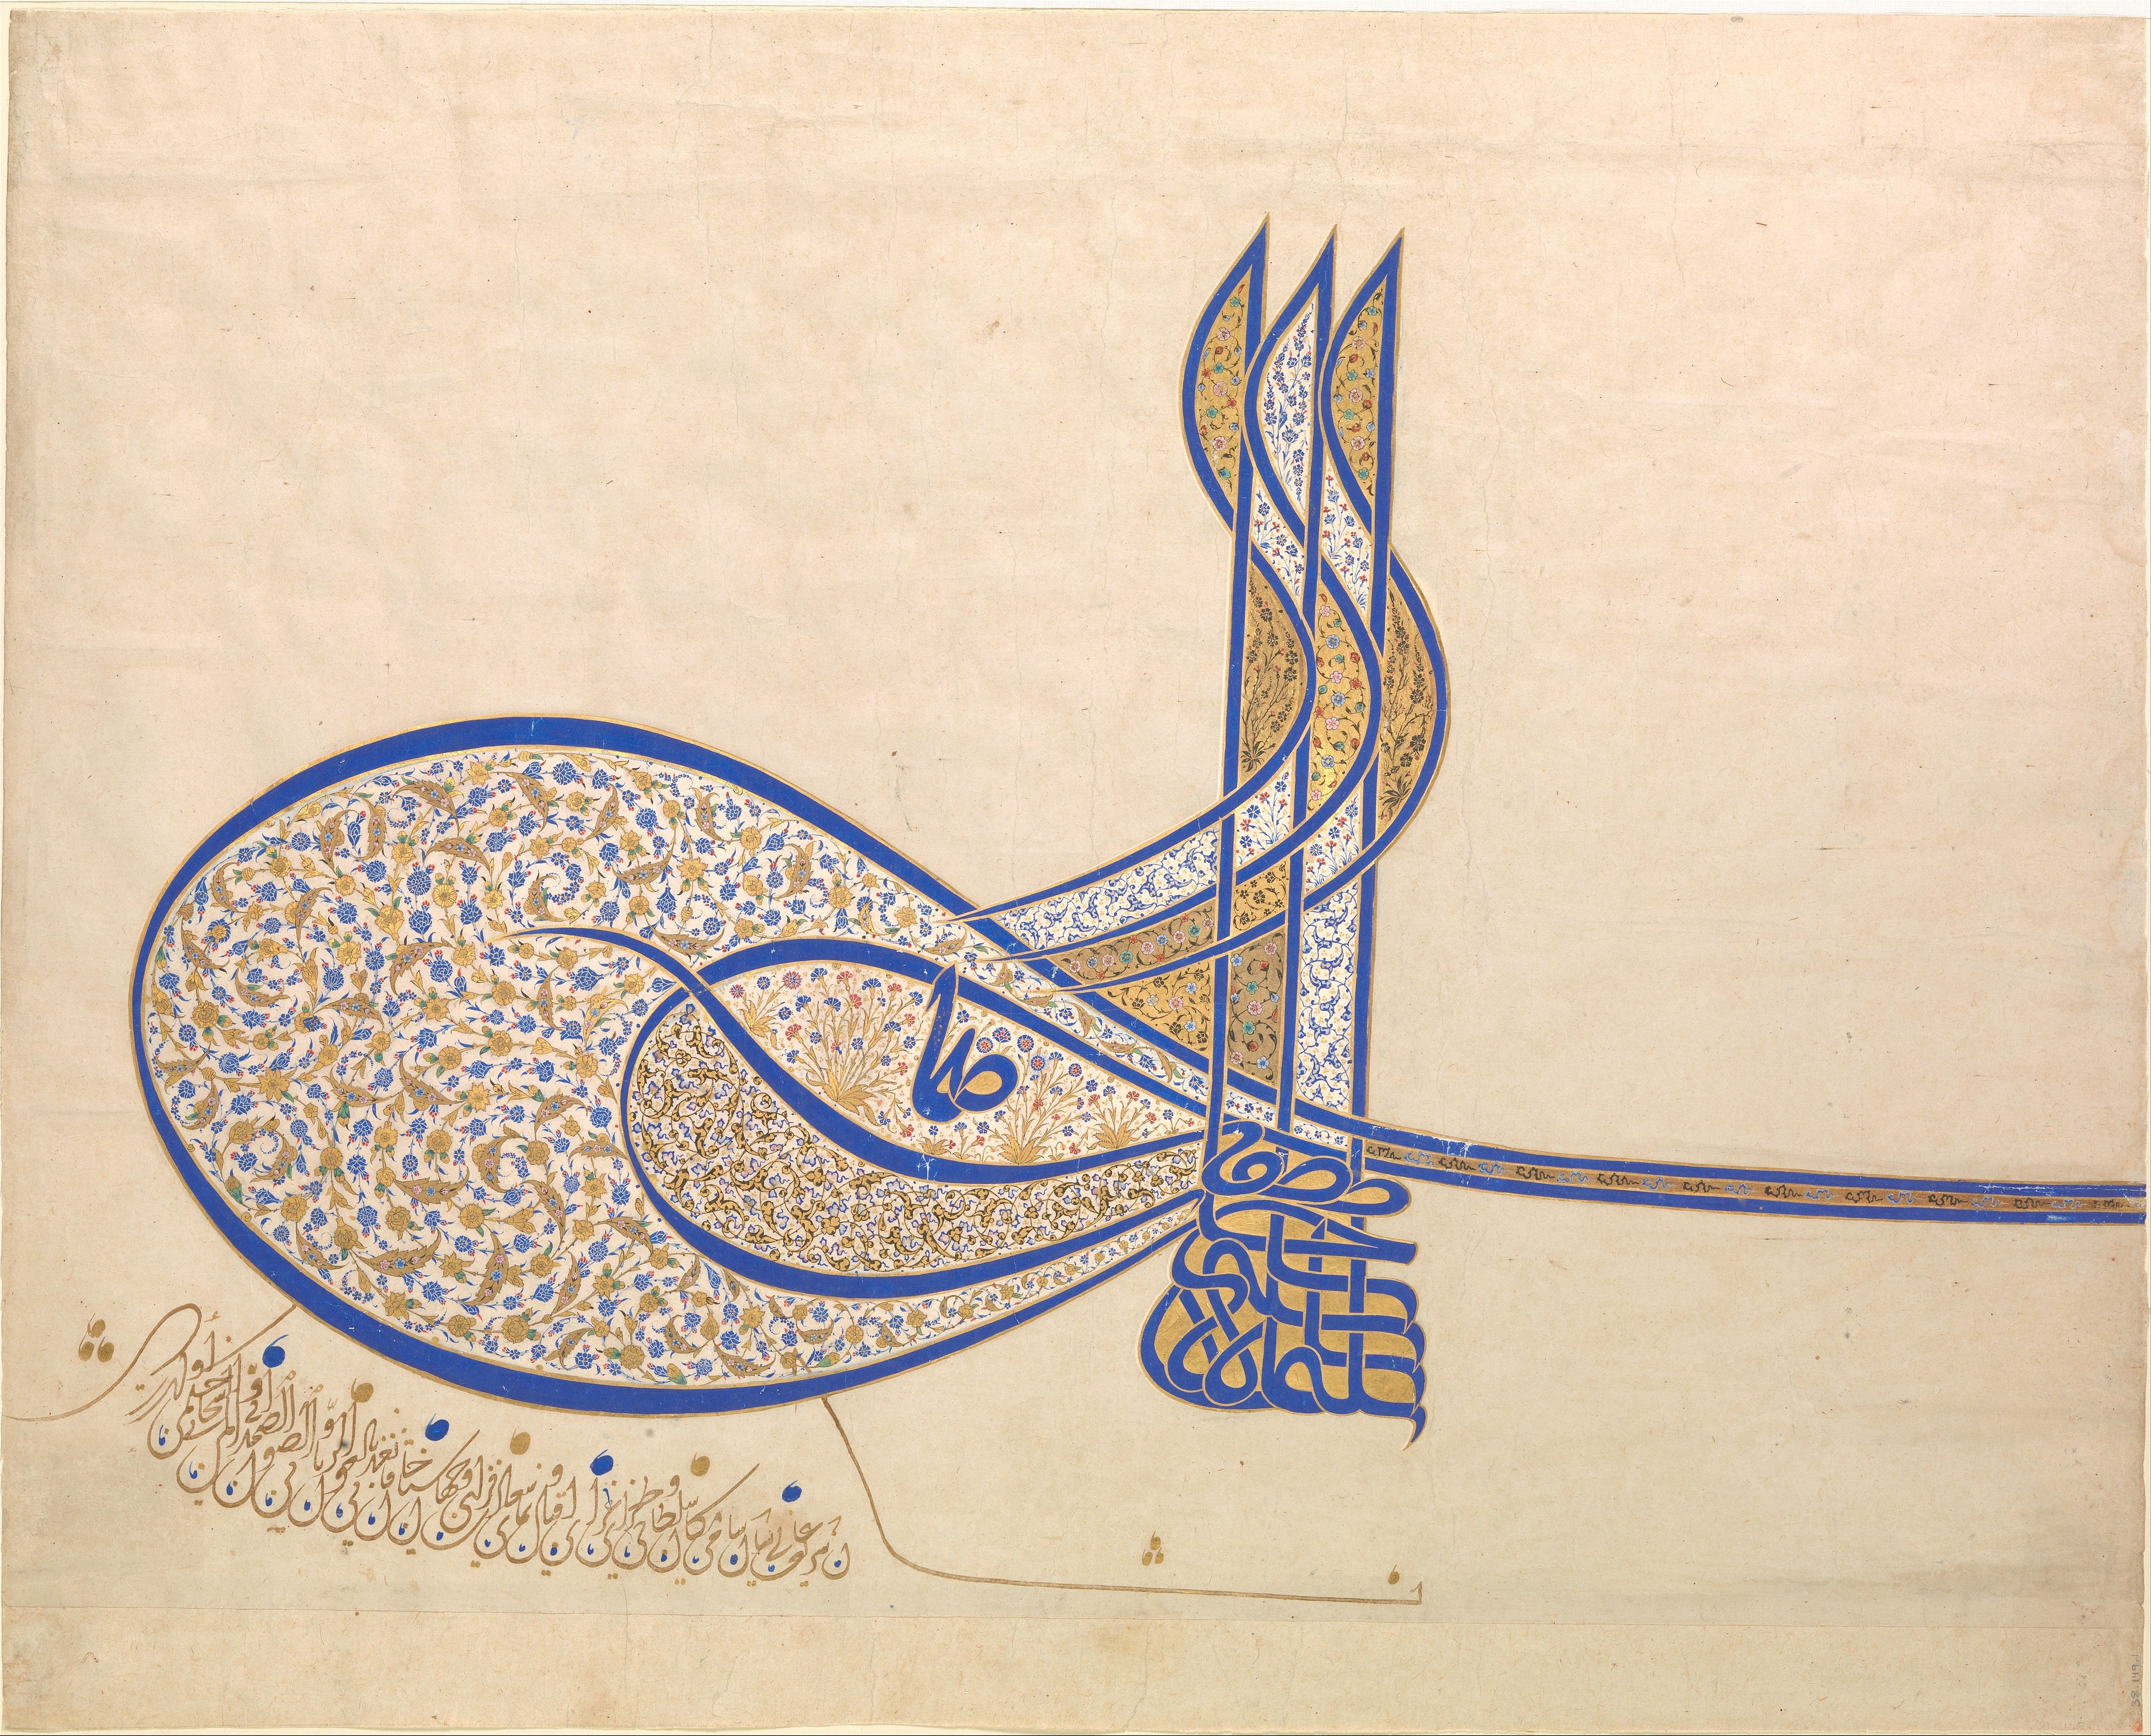 https://upload.wikimedia.org/wikipedia/commons/f/f2/Tughra_Suleiman.jpg